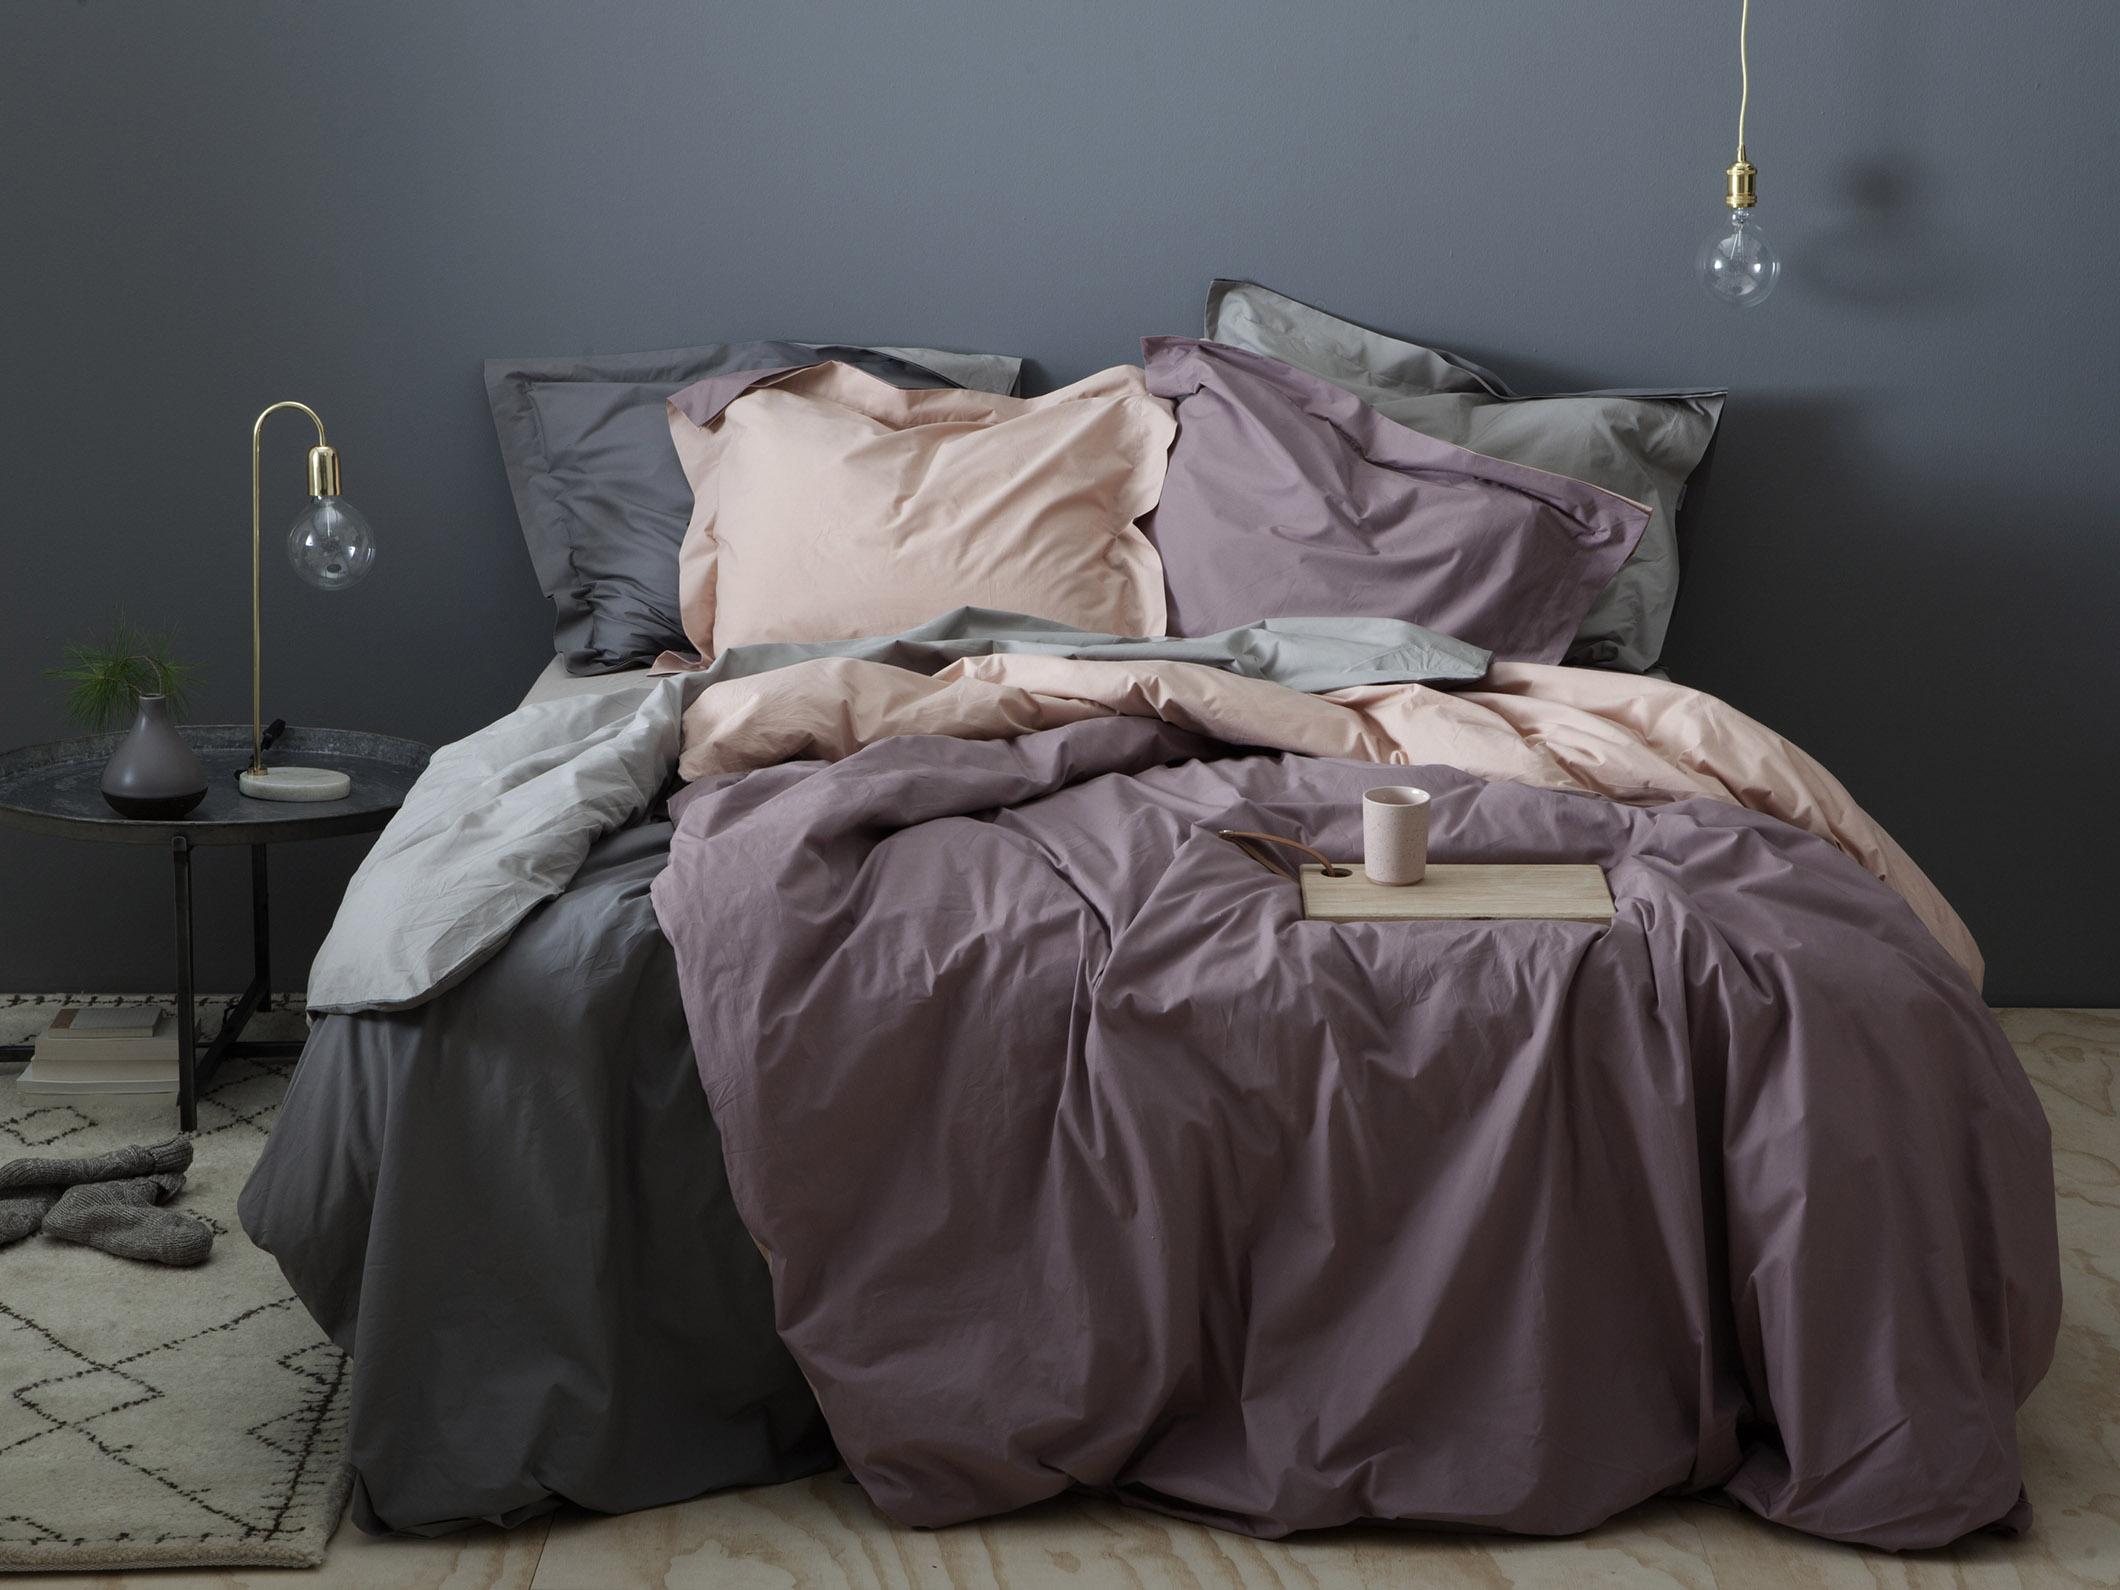 Bedding by Wehkamp